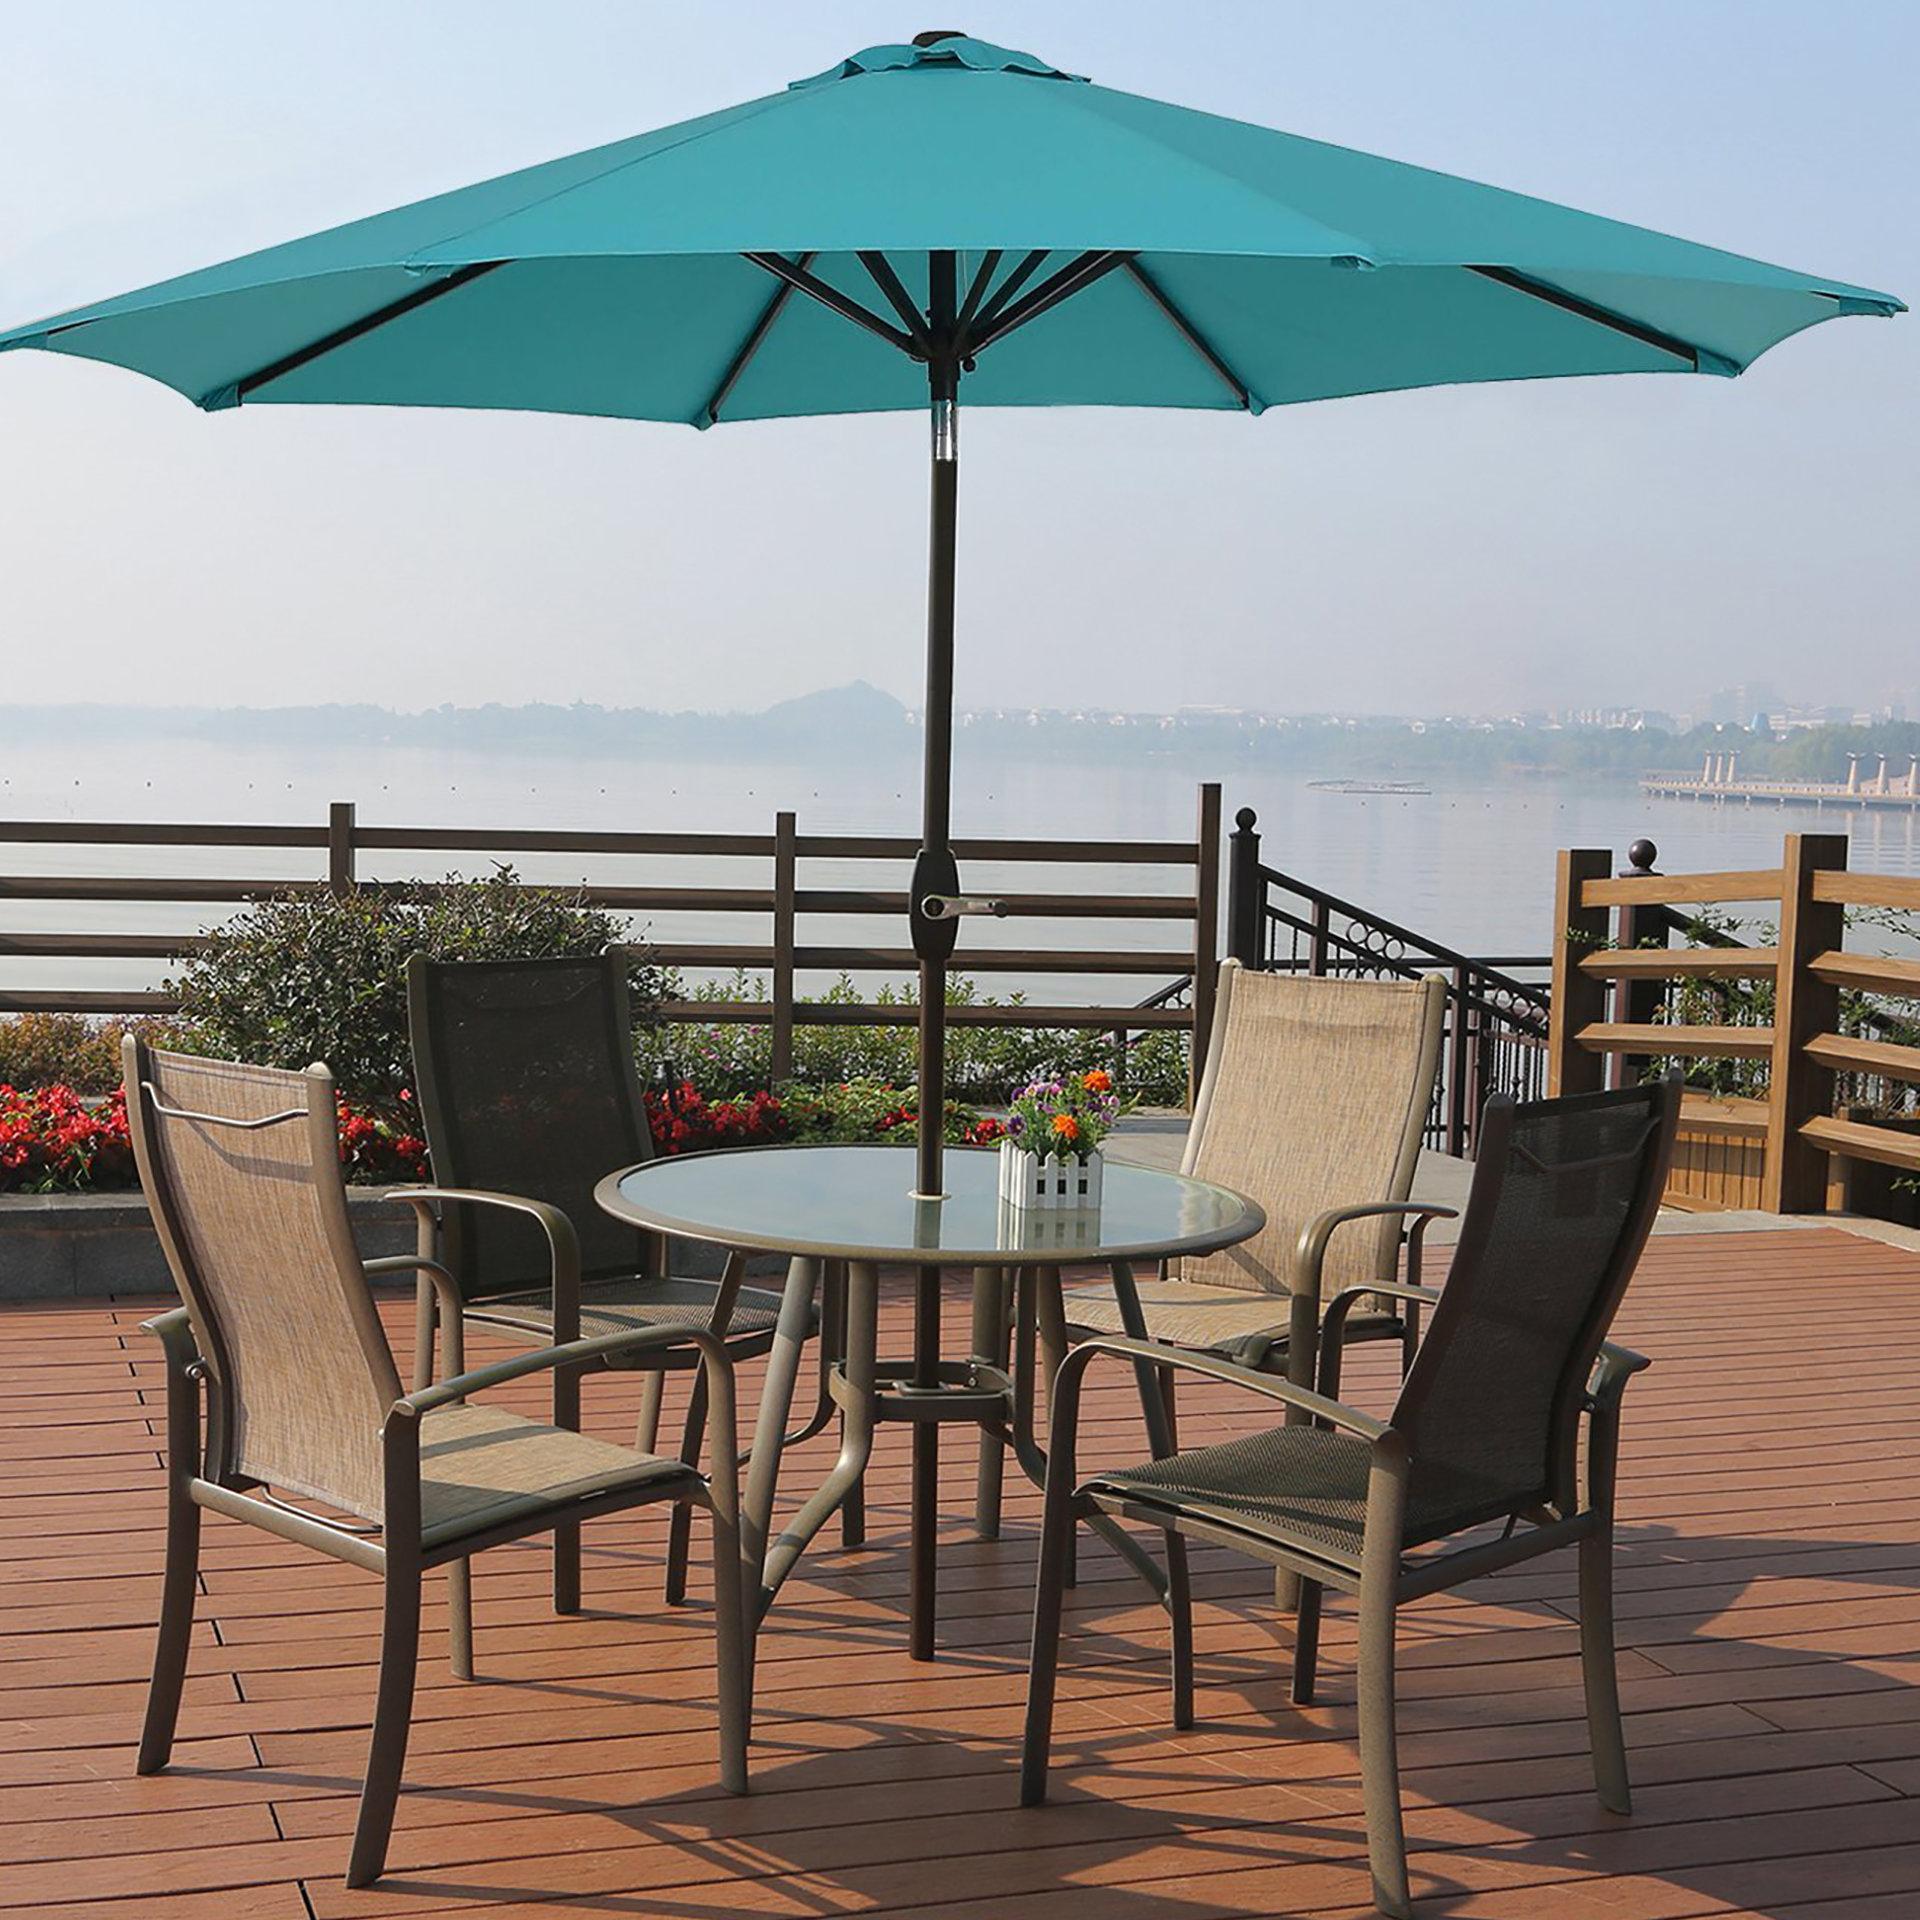 Most Recent Kenn 9' Market Umbrella Intended For Taube Market Umbrellas (View 9 of 20)